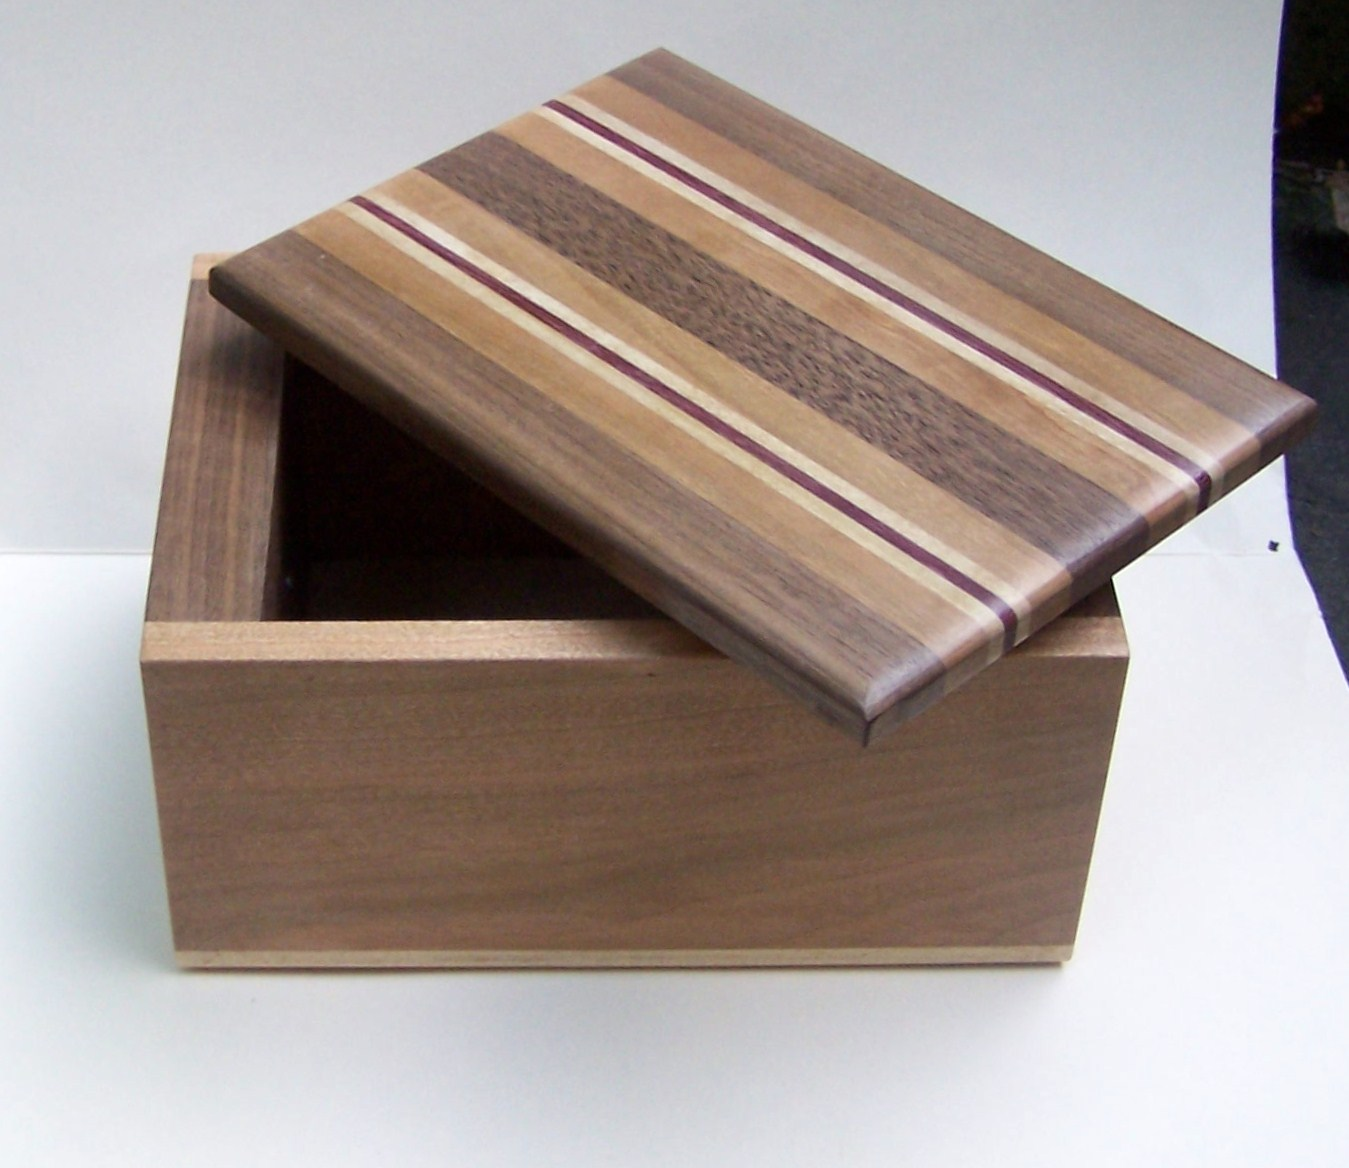 Motherhood and Mindfulness: Wooden Box